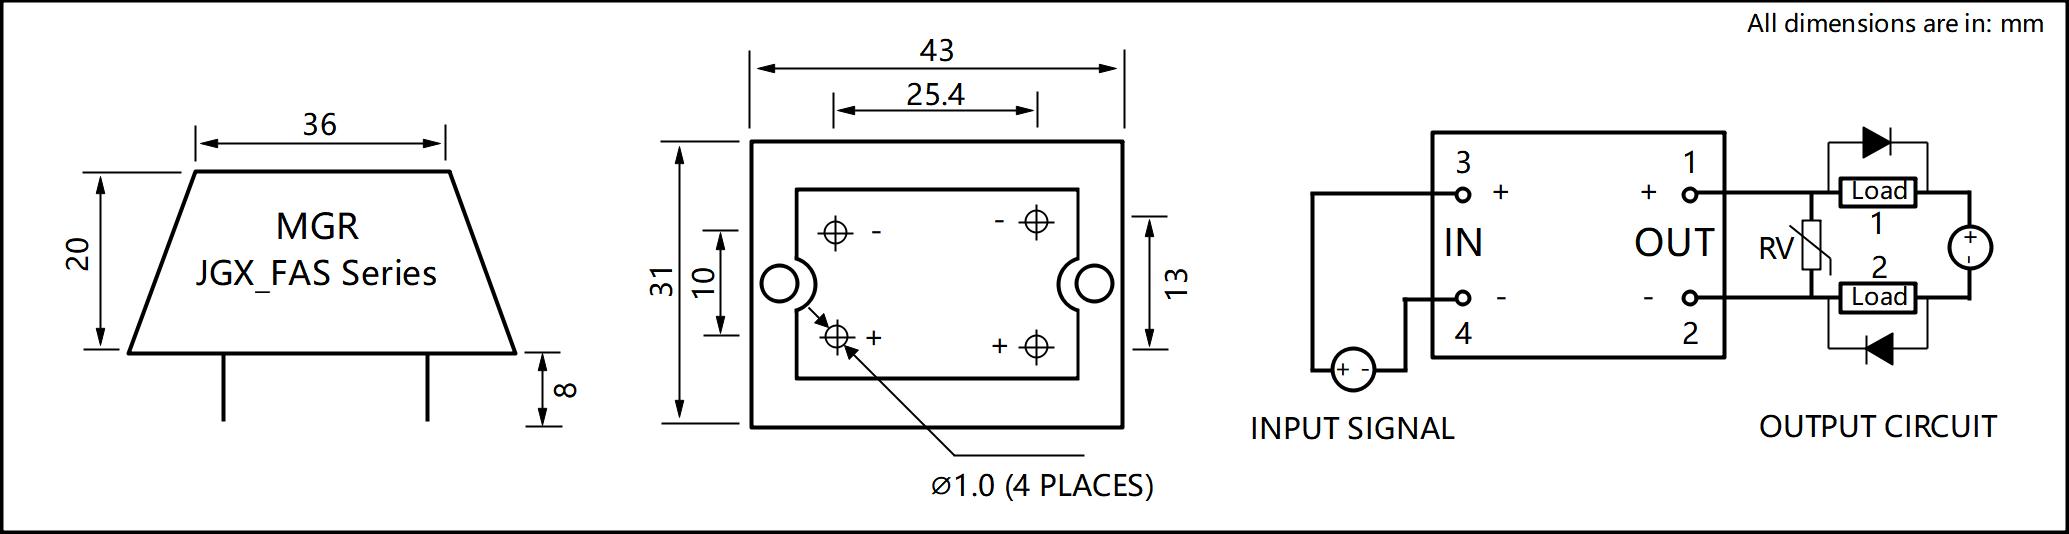 JGX_FA Series Cast Aluminum-zinc Alloy Housing PCB Mount Solid State Relay Circuit Wring Diagram